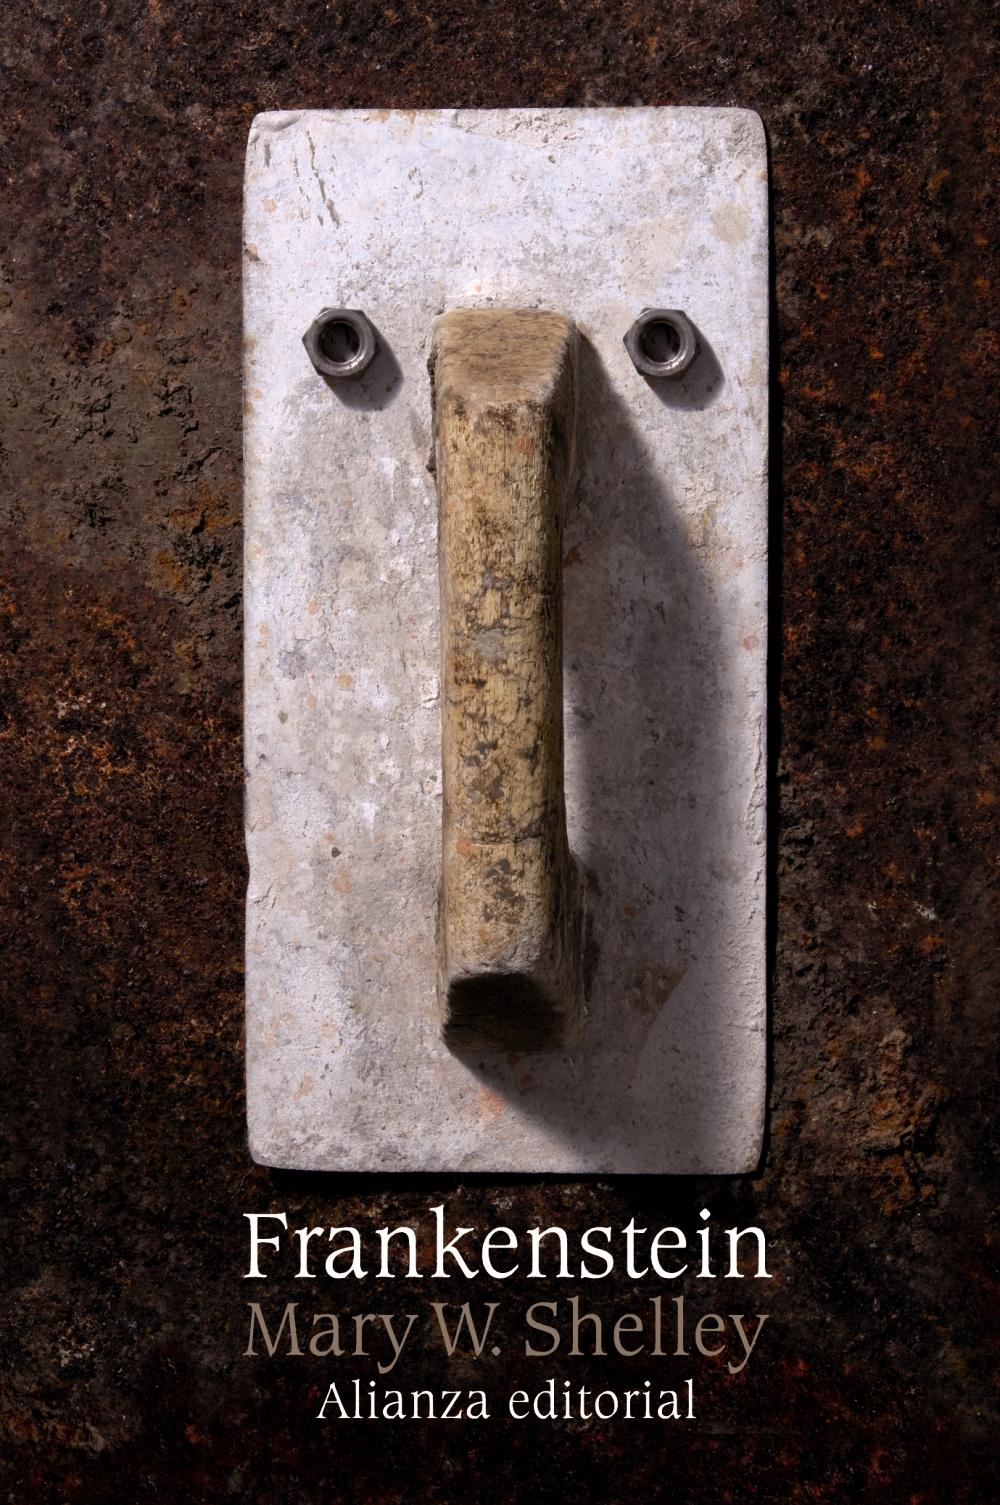 Frankenstein o el moderno Prometeo - Alianza Editorial